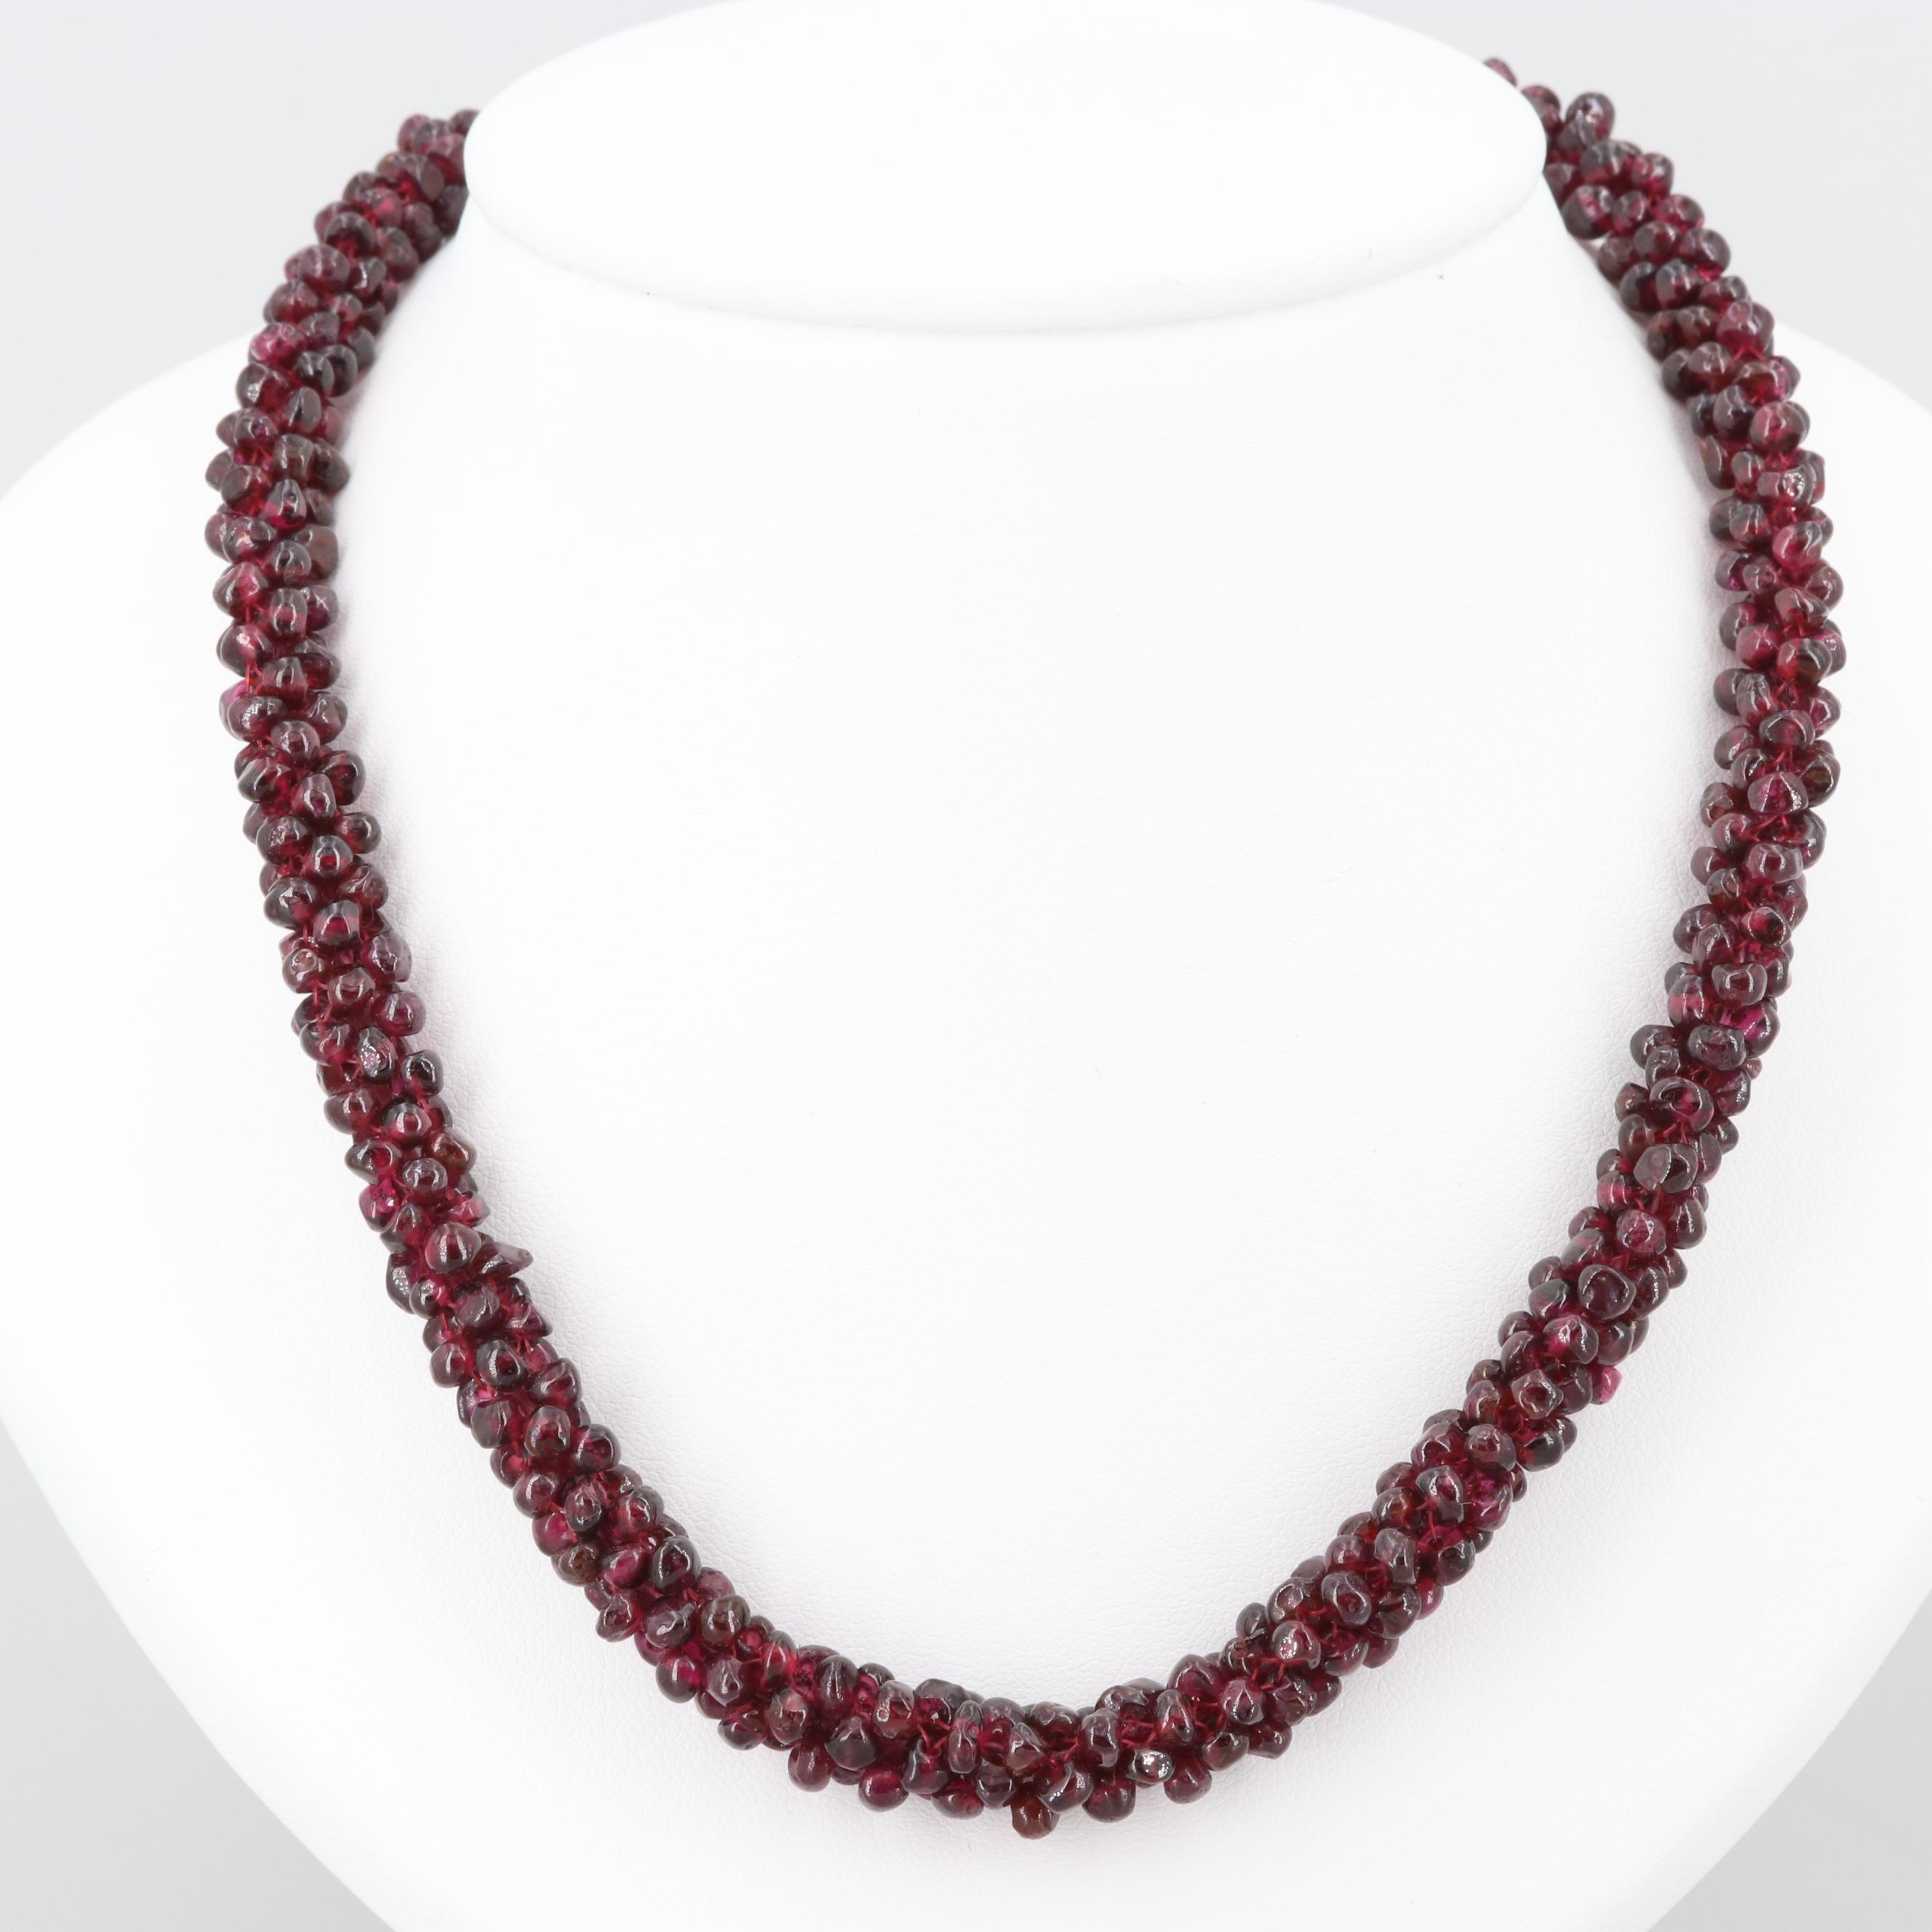 Wovan Garnet Beaded Necklace